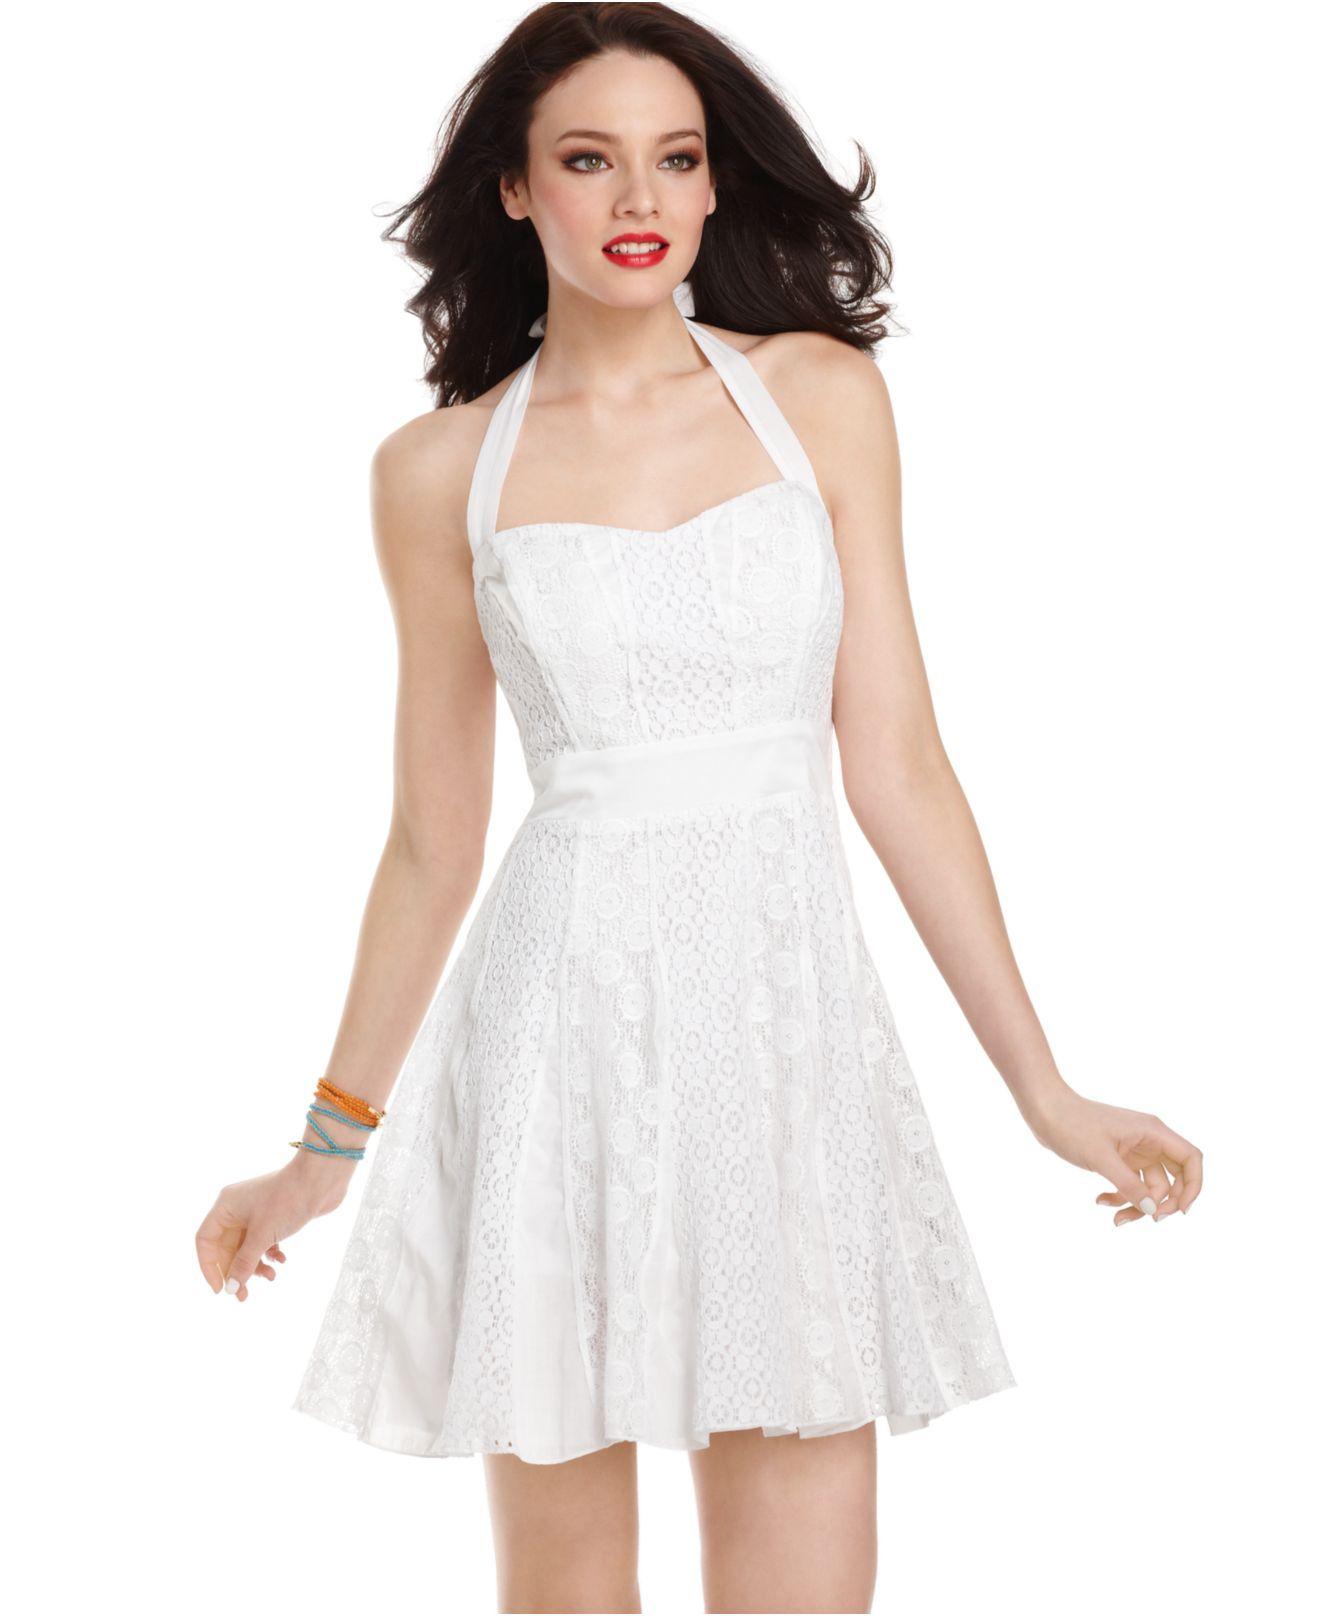 Halter Dresses On Sale